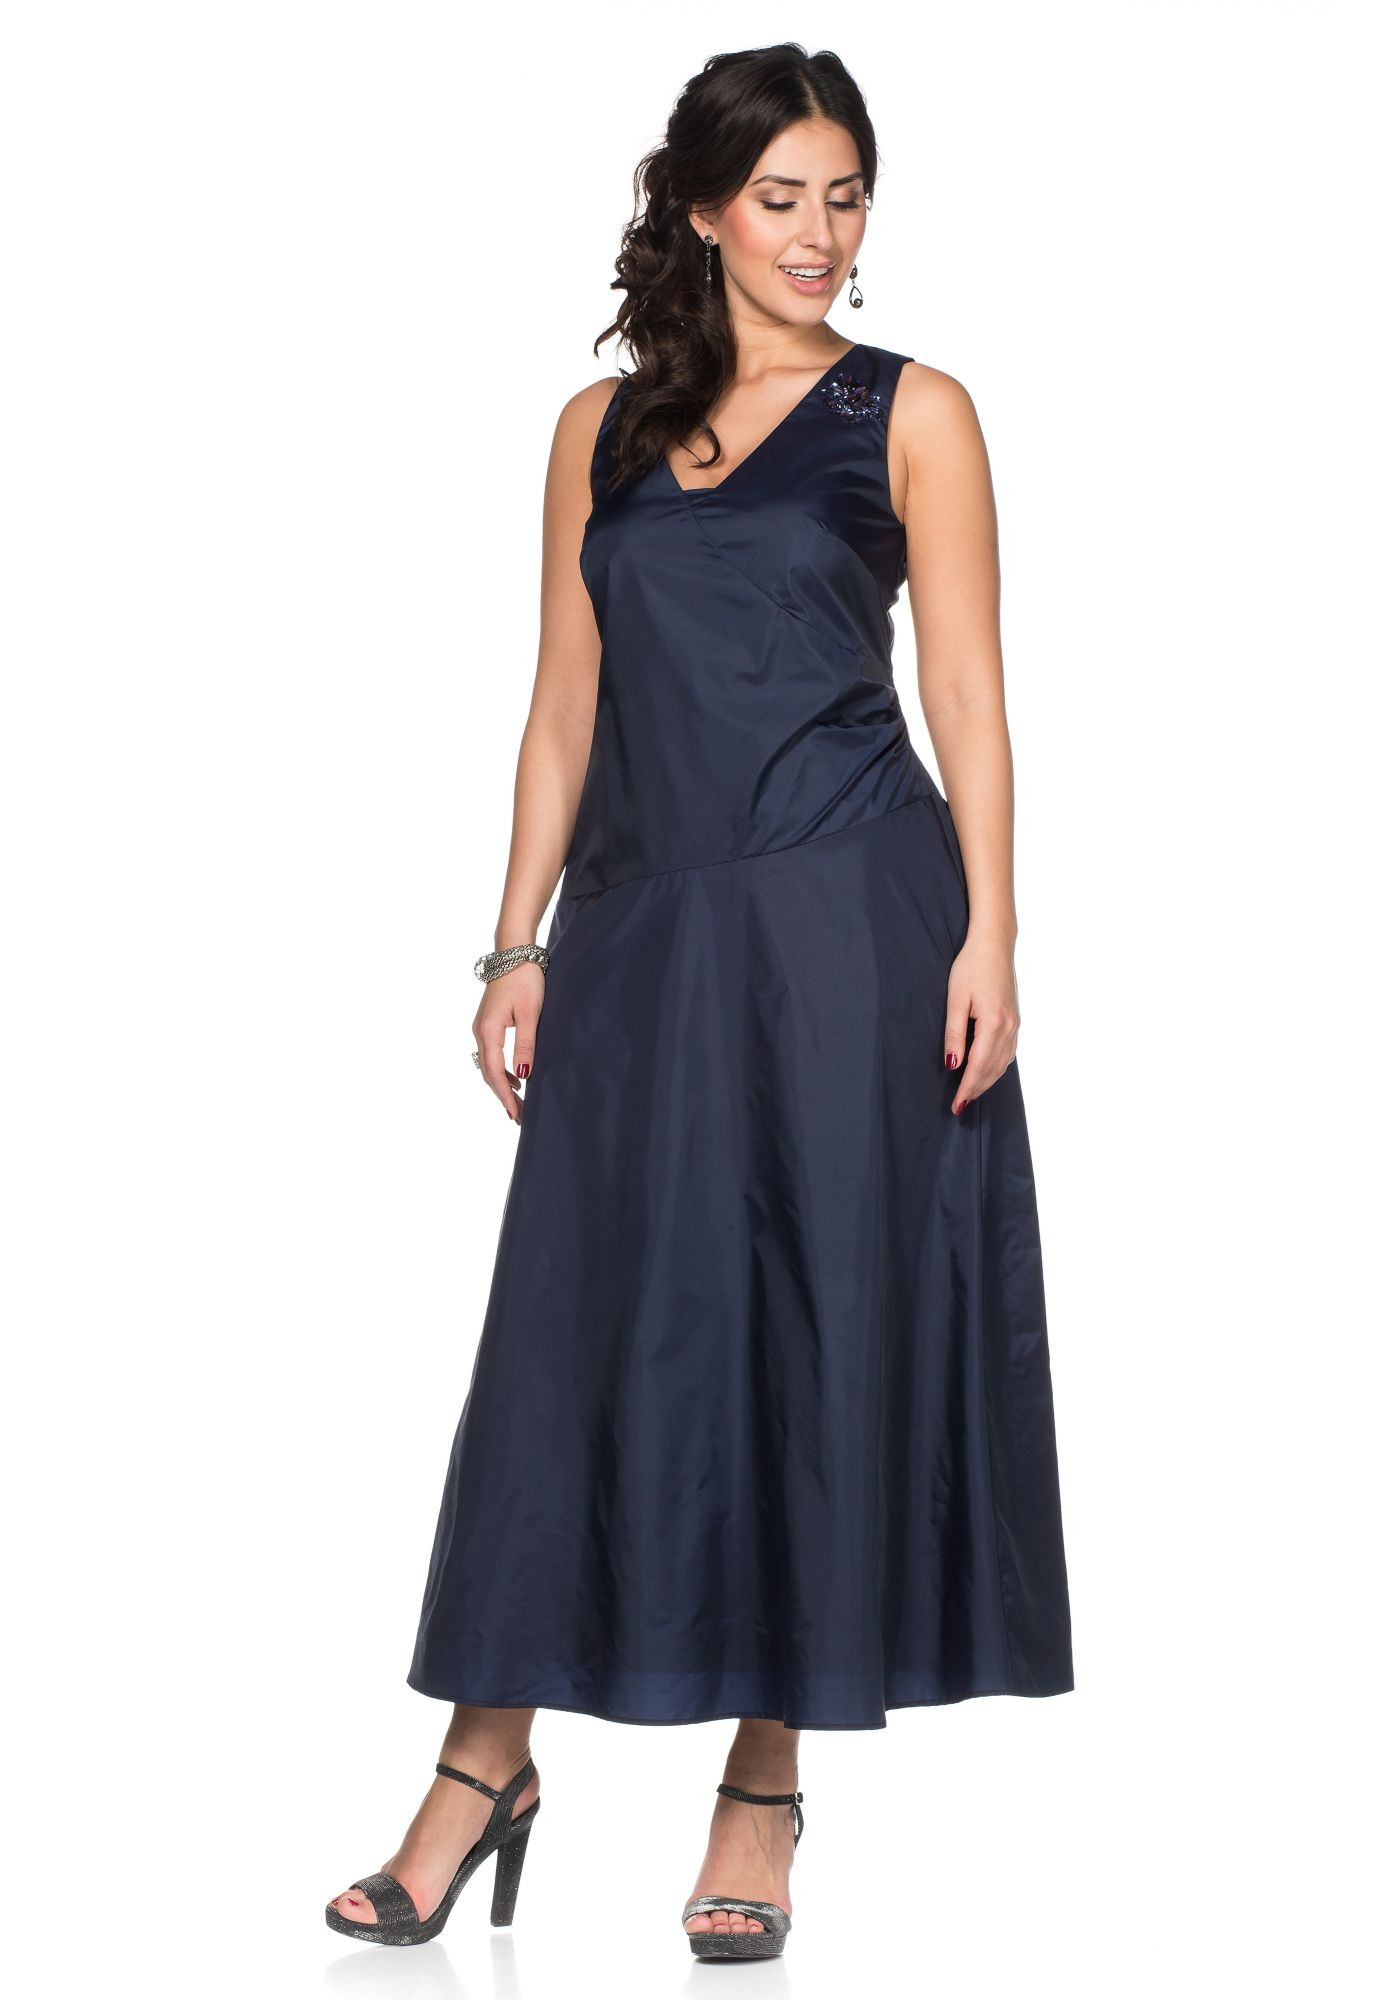 Sheego Style Abendkleid Marine Kurzgr Neu Kp 13999